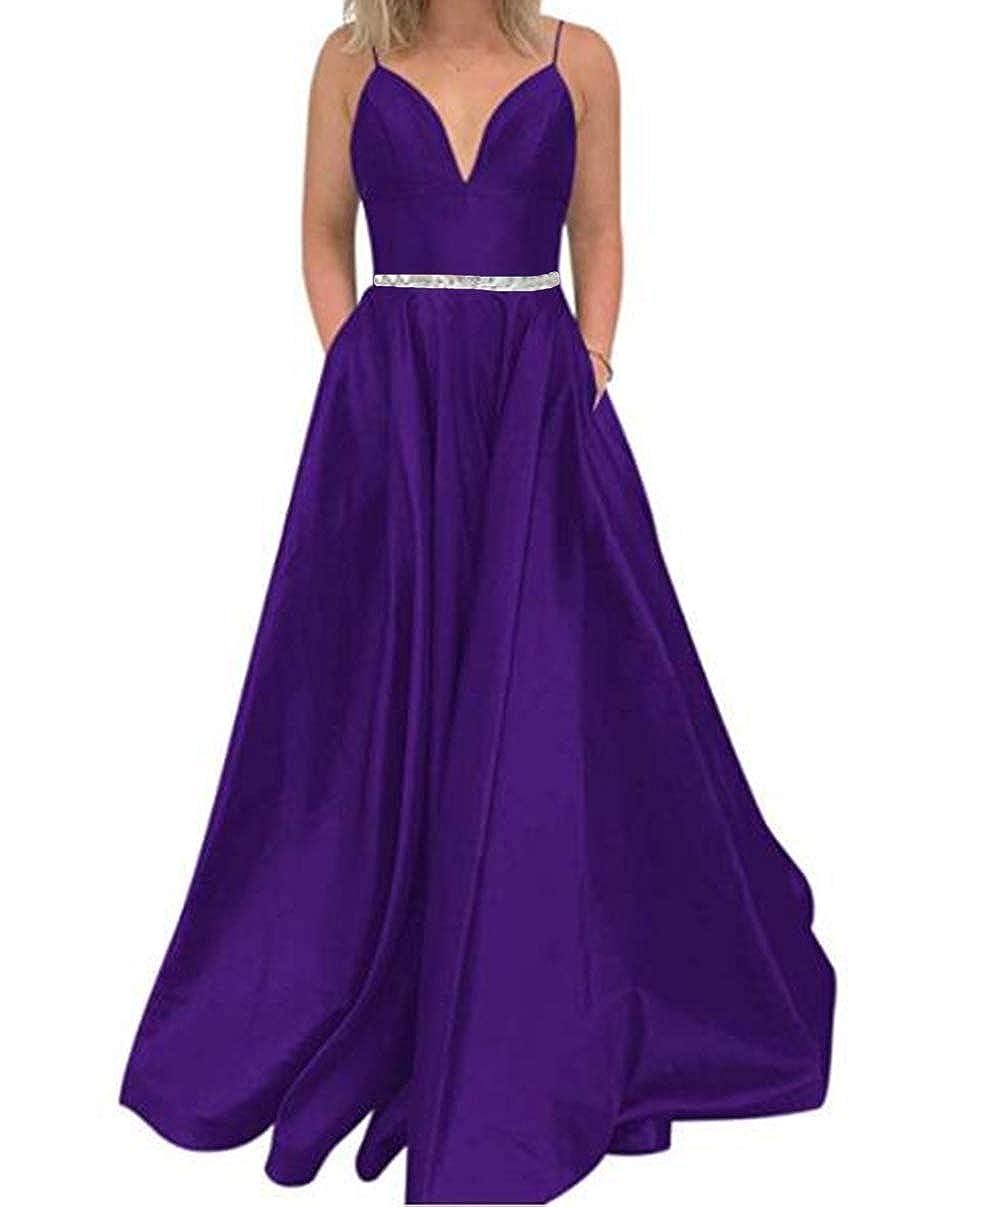 Dark Purple Tsbridal Women's A Line Bead Prom Dresses V Neck Satin with Pockets Evening Gown